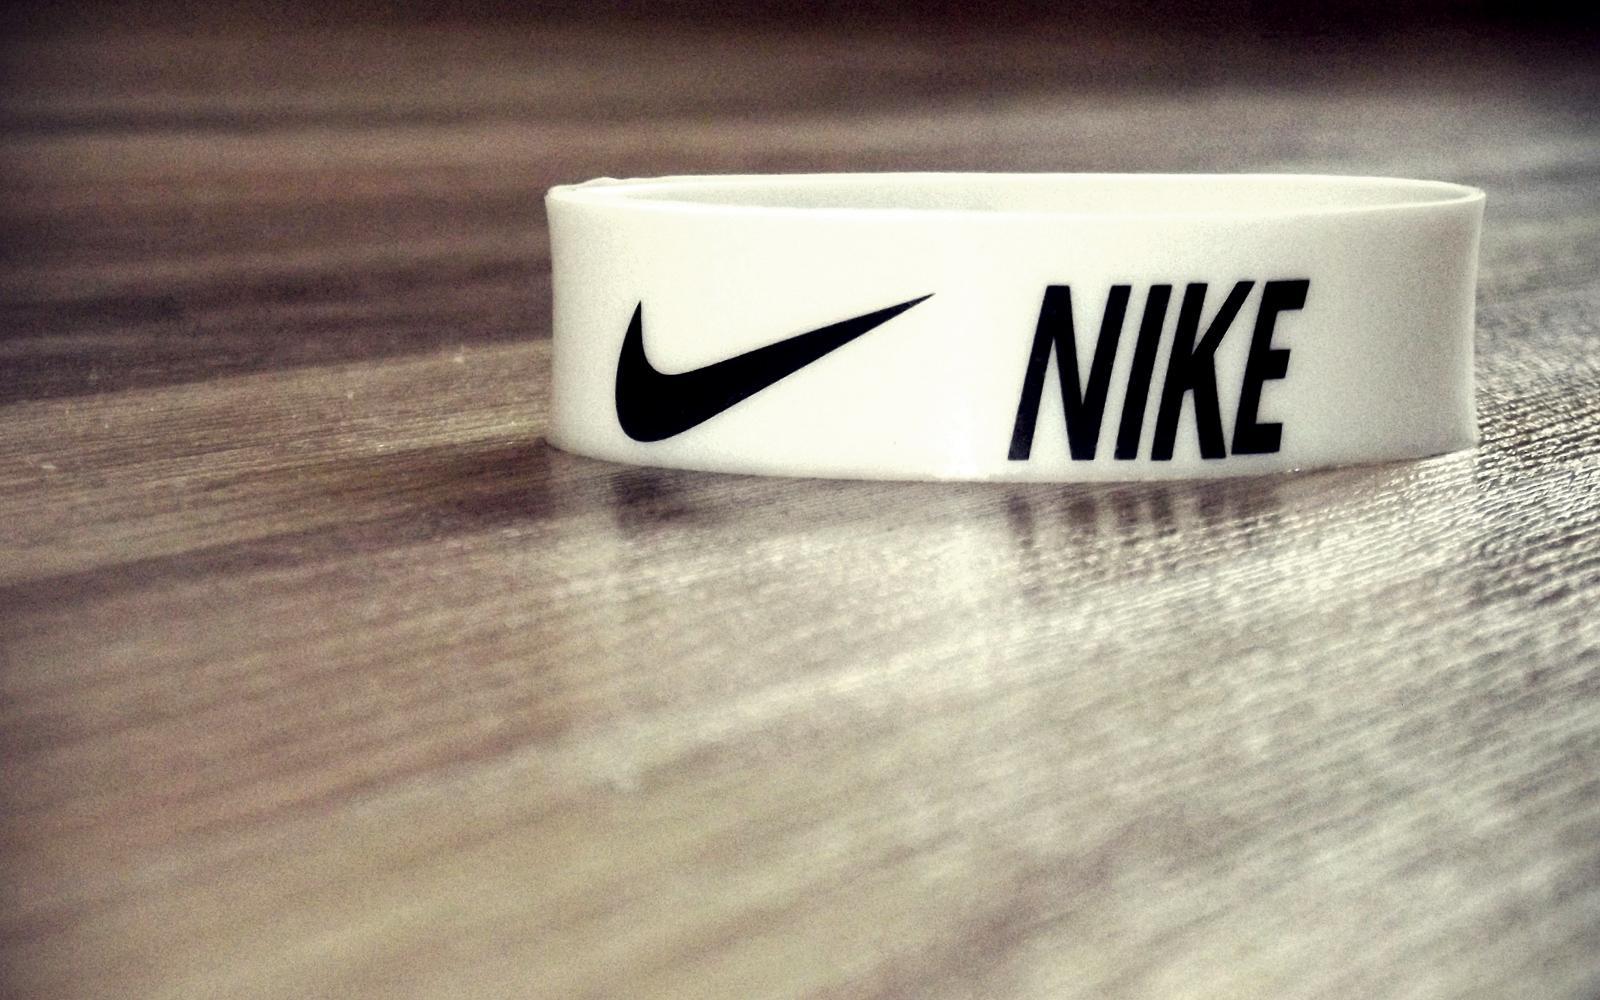 Nike Makes Kaepernick Face Of Brand, Nike Shares Fall